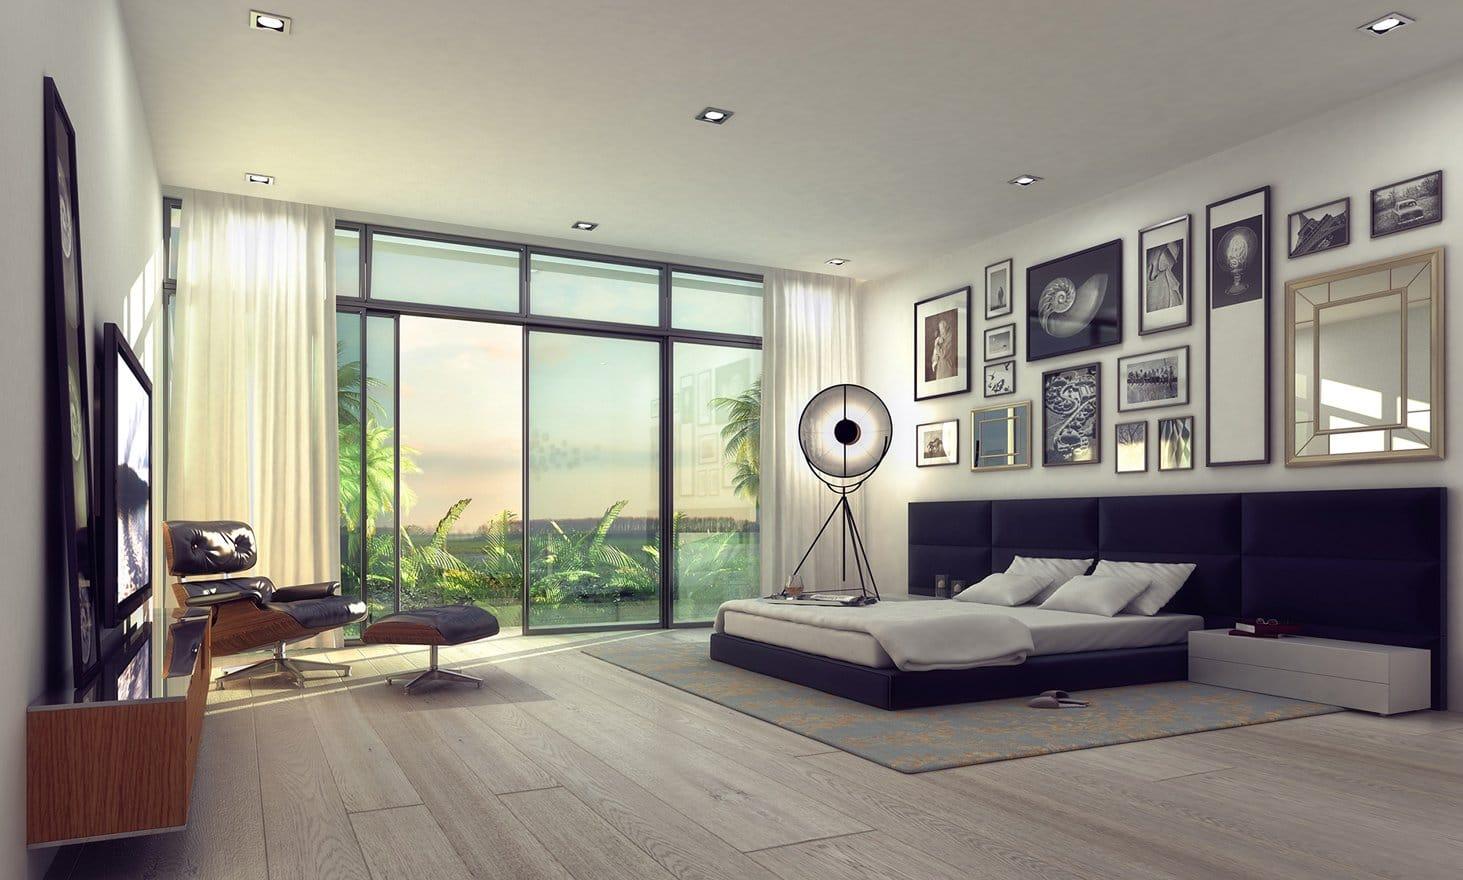 Interior Design bedroom view project in 77 Bal Harbuor, Florida